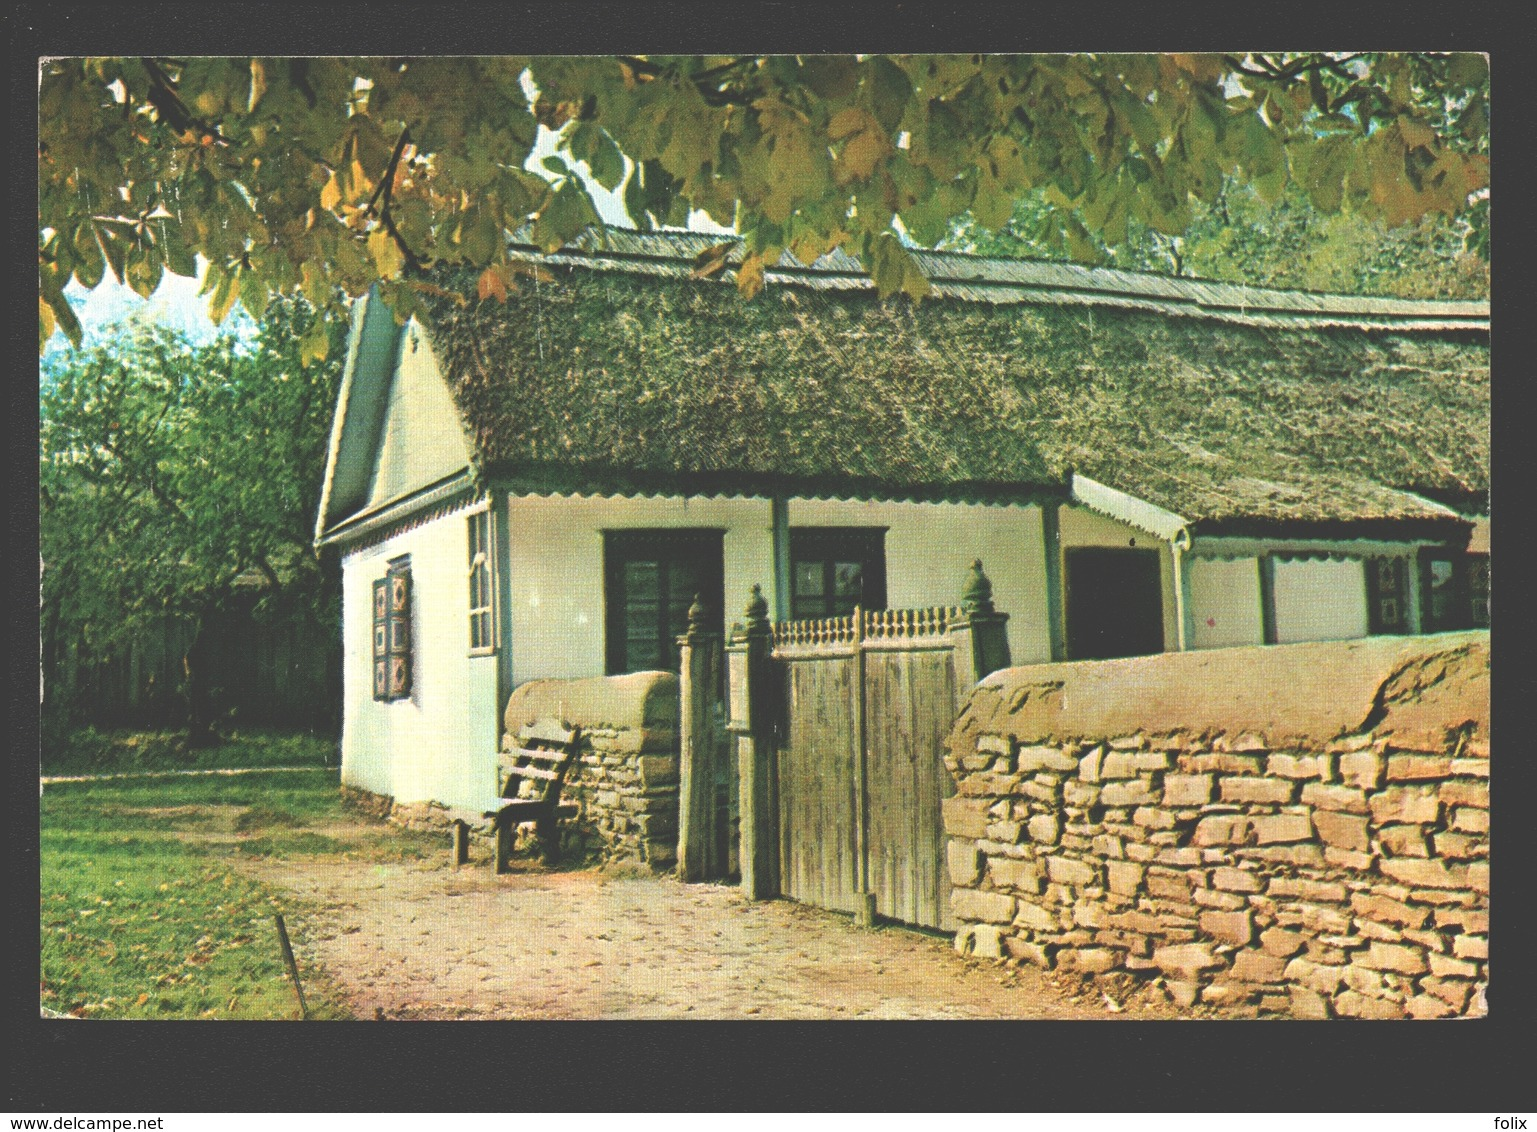 Tilisca - The Village Museum - House Jurilovka Village, Tulcea County, 1898 - Roumanie